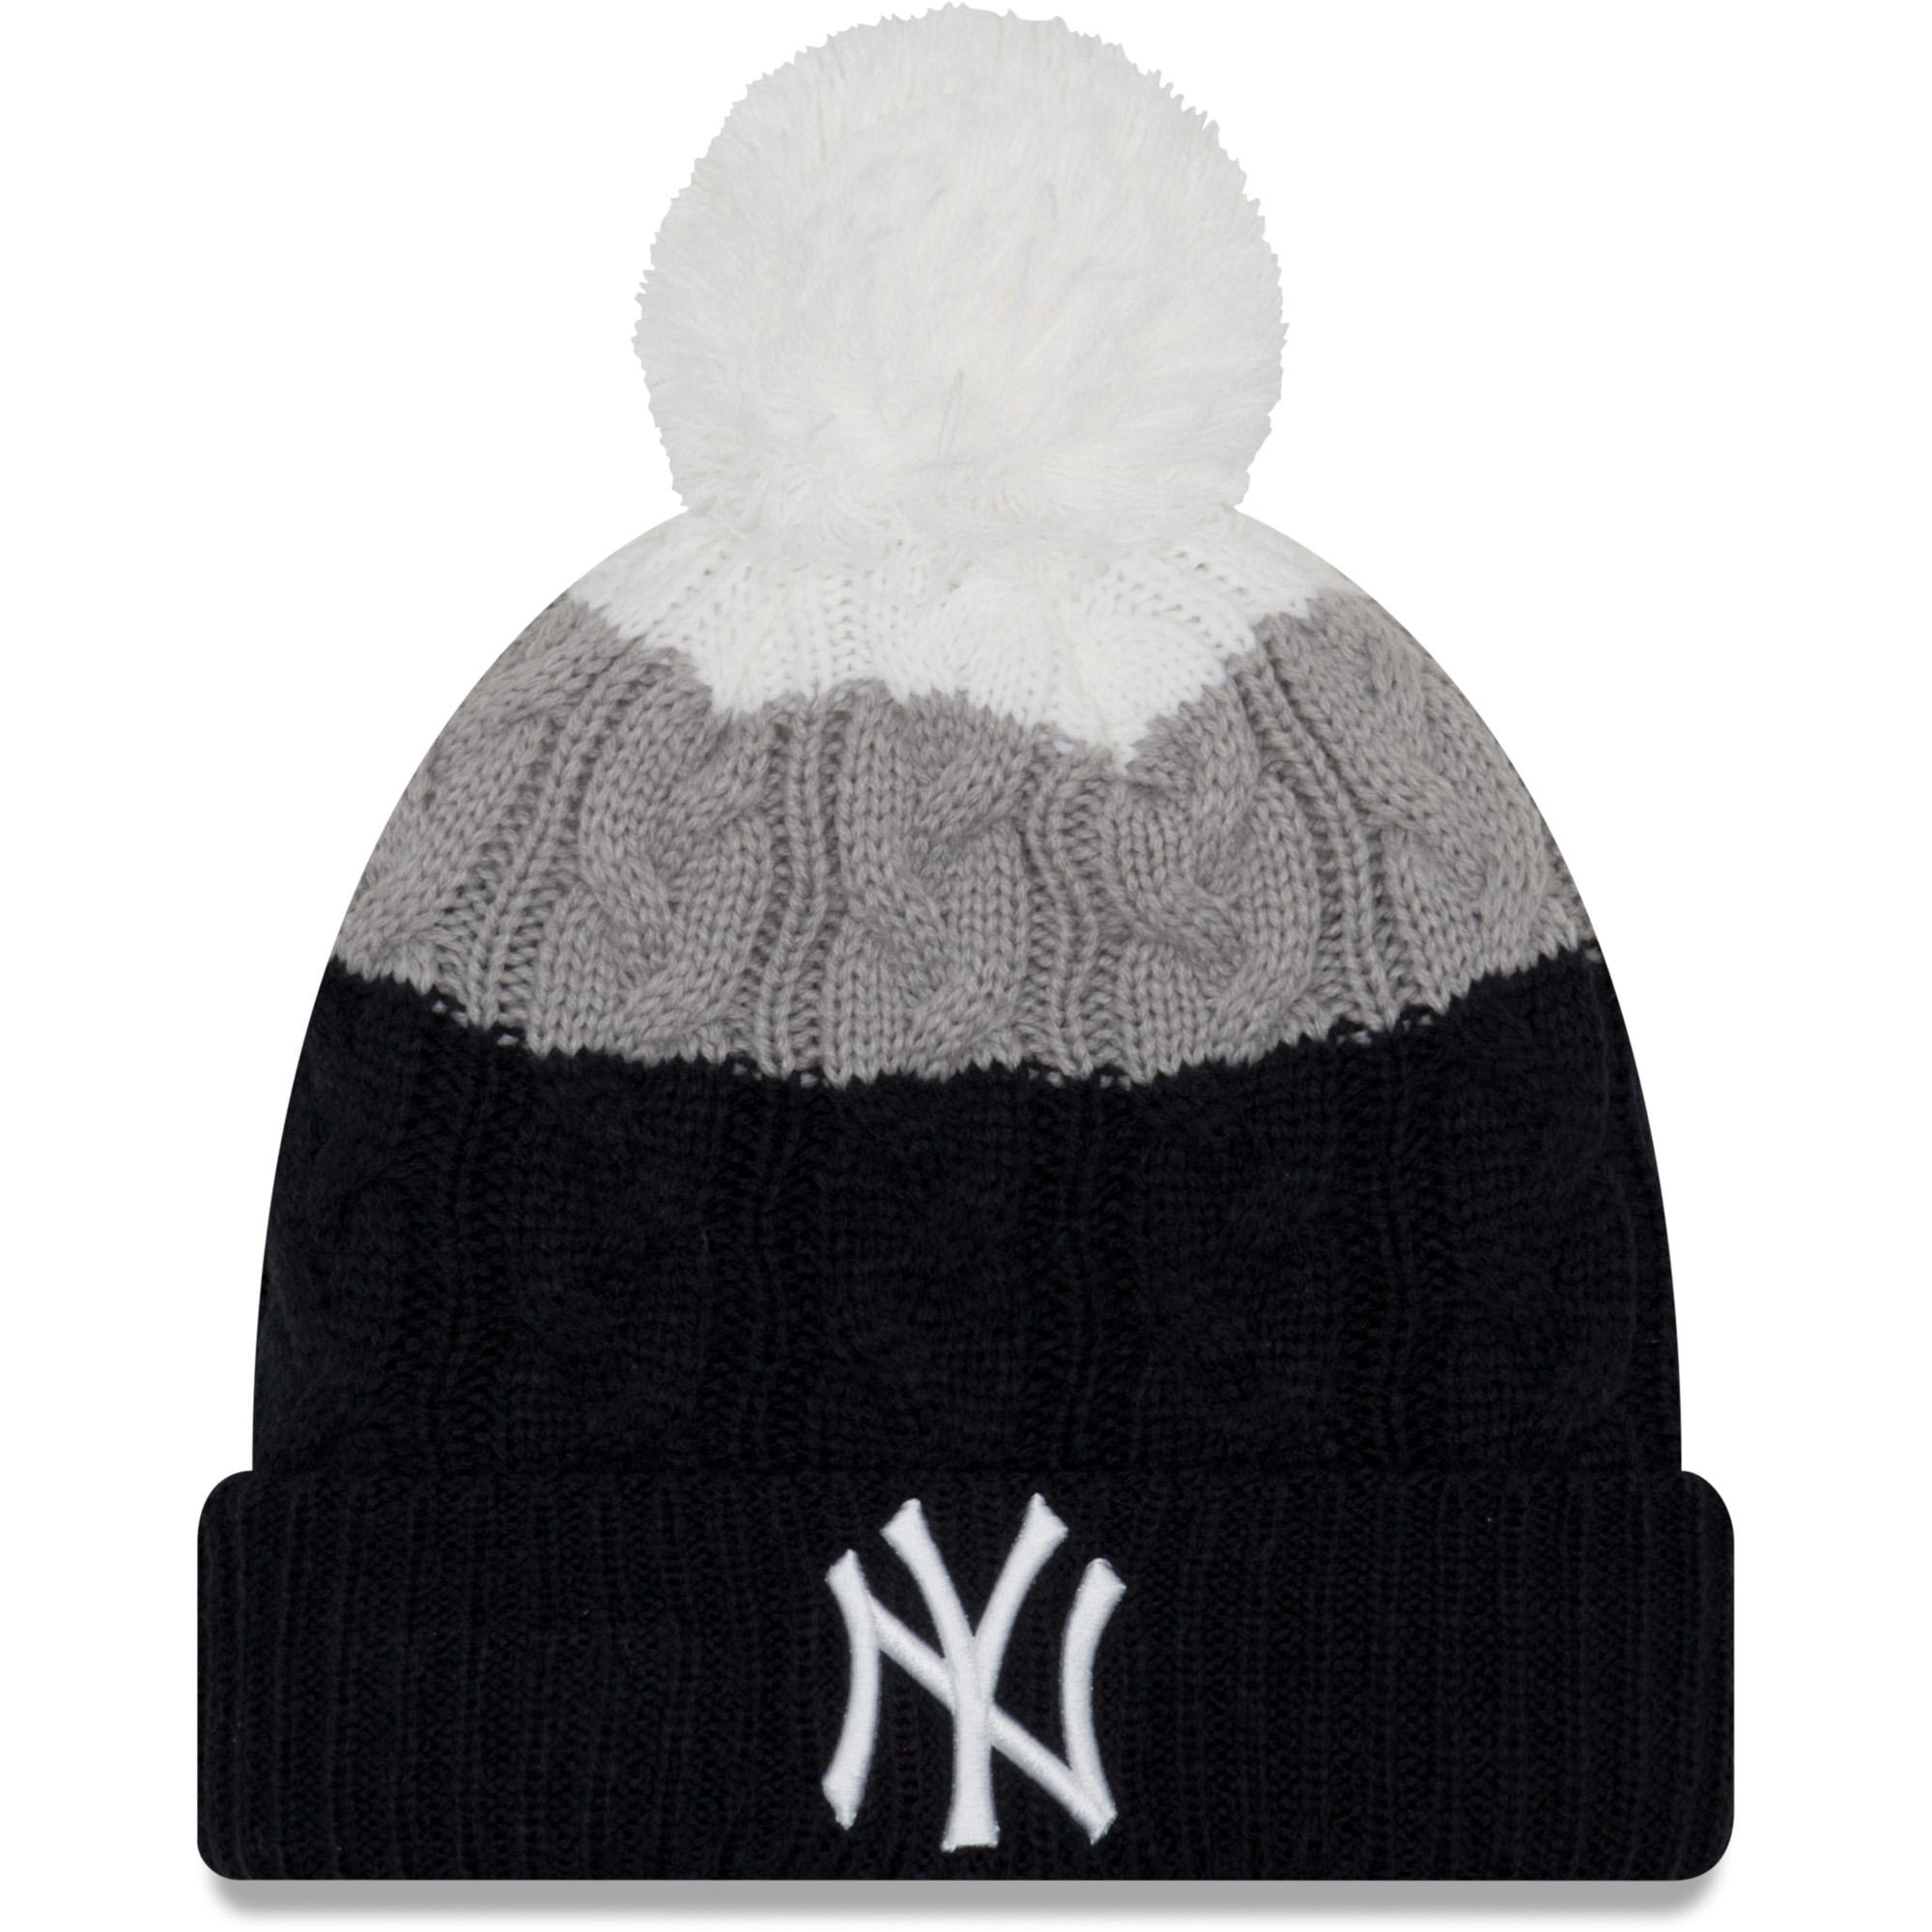 New York Yankees New Era Women's Layered Up 2 Cuffed Knit Hat with Pom Navy OSFA by NEW ERA CAP COMPANY